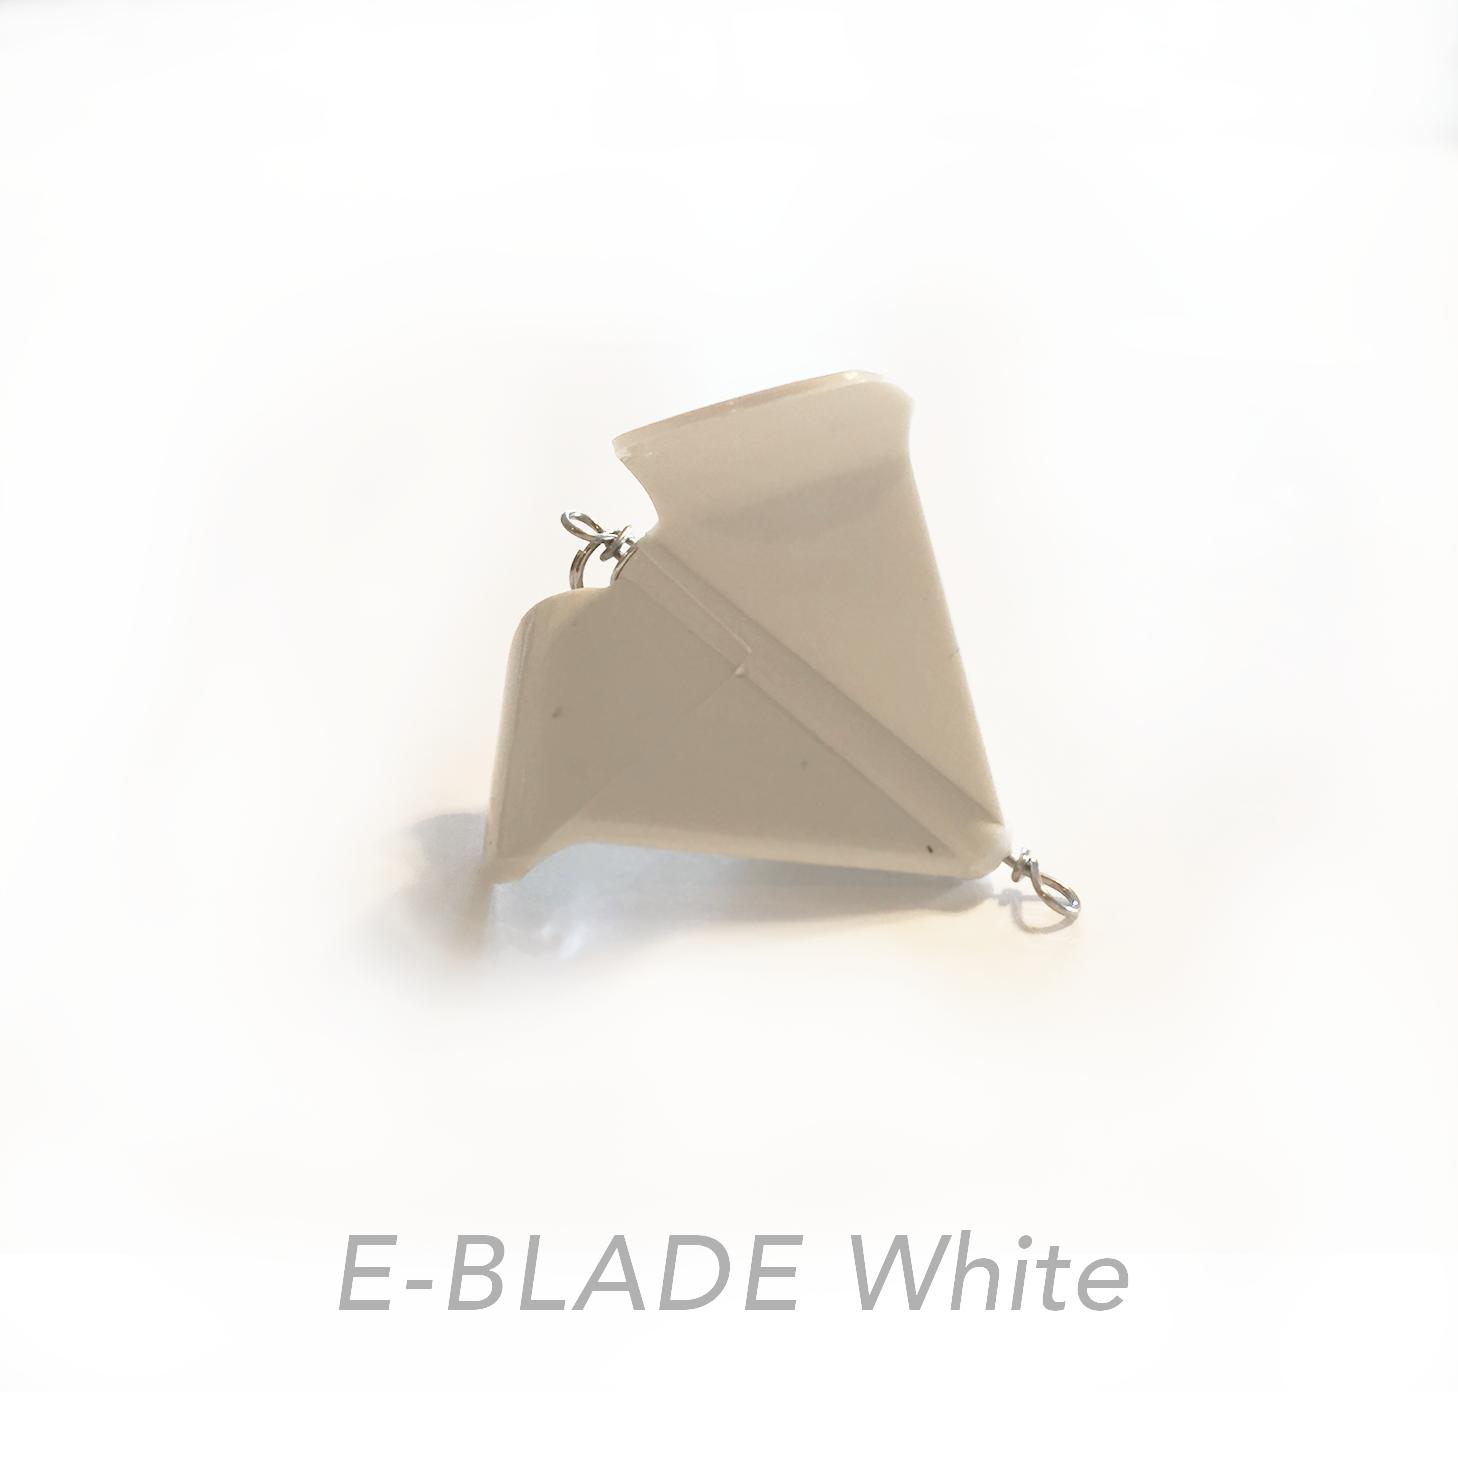 eblade-white.png